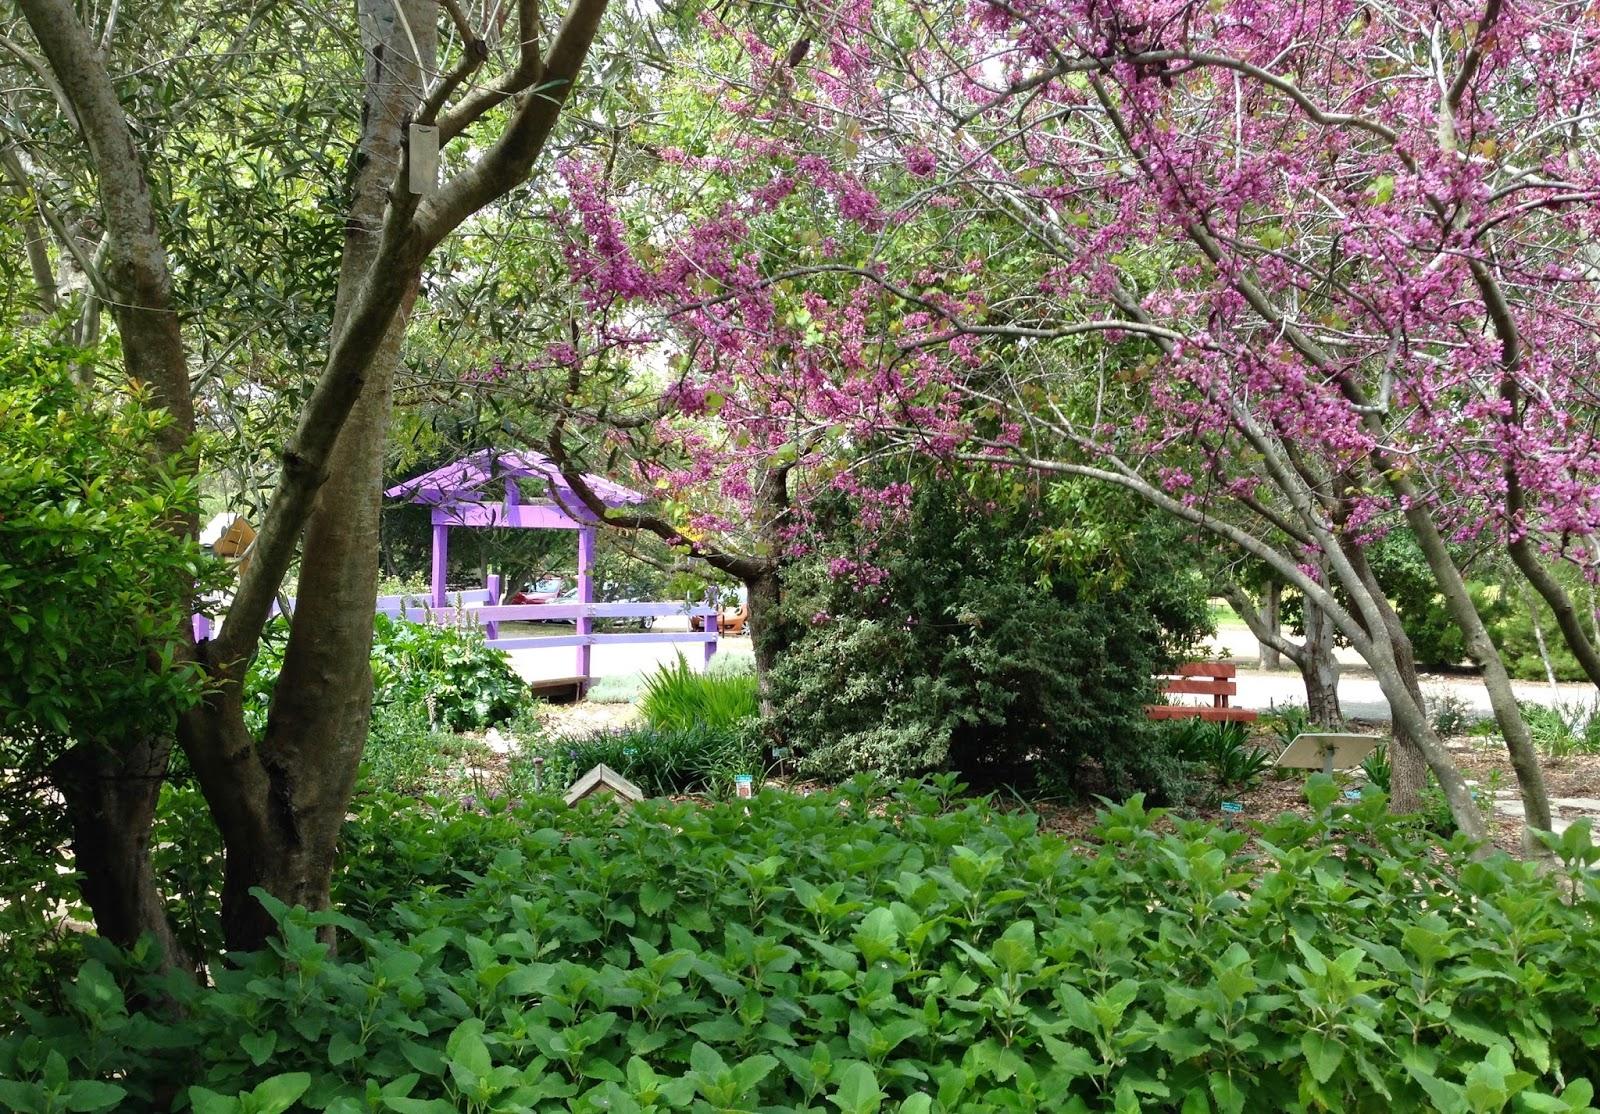 Charmant Birding The San Luis Obispo Botanical Garden